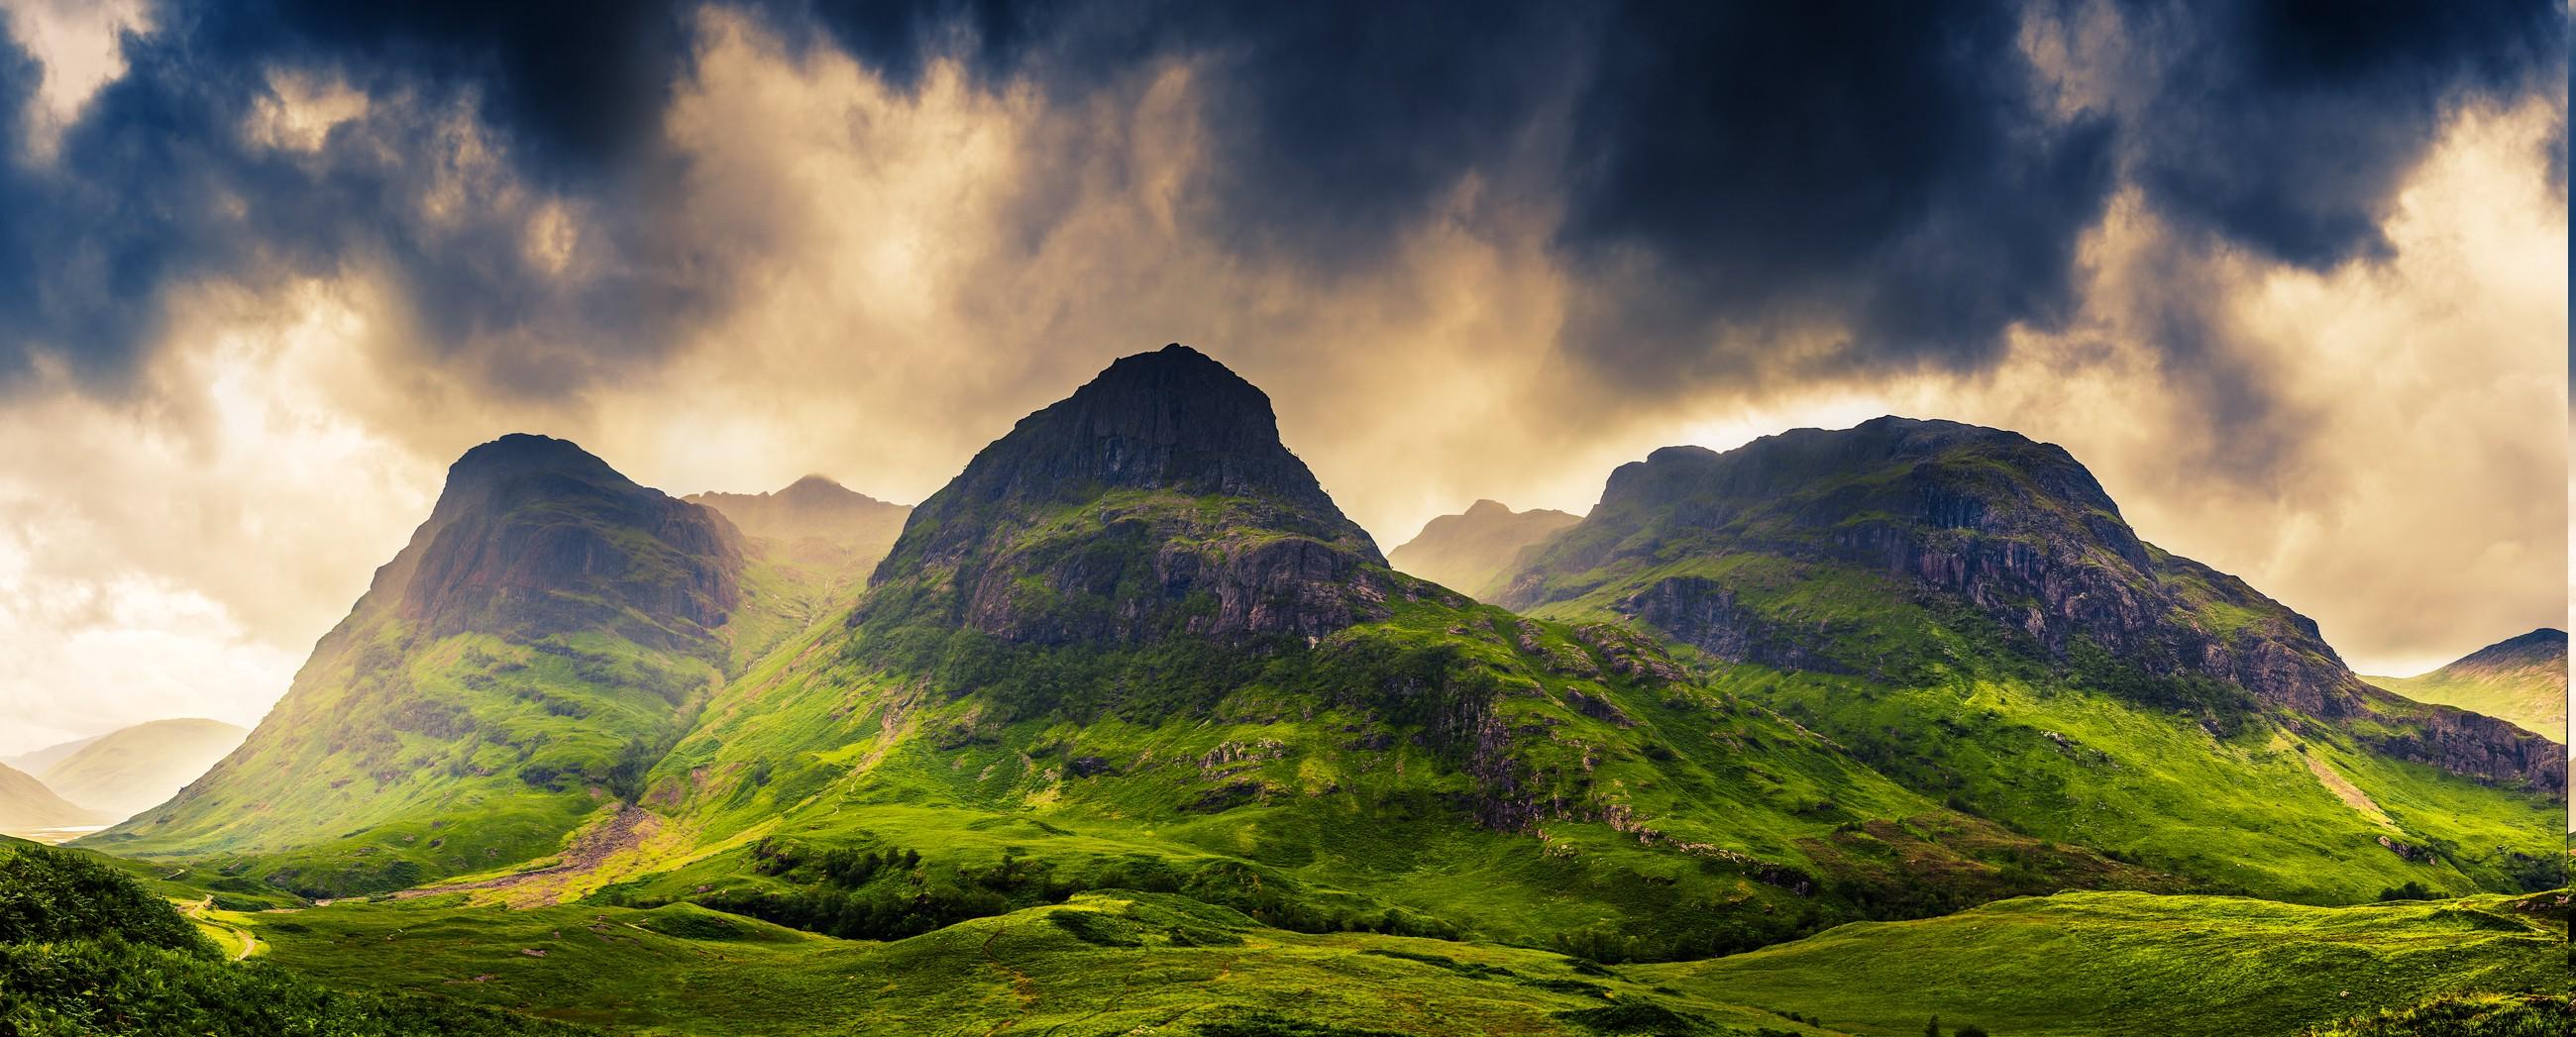 Wallpaper 2600x1047 Px Clouds Grass Landscape Mountain Nature